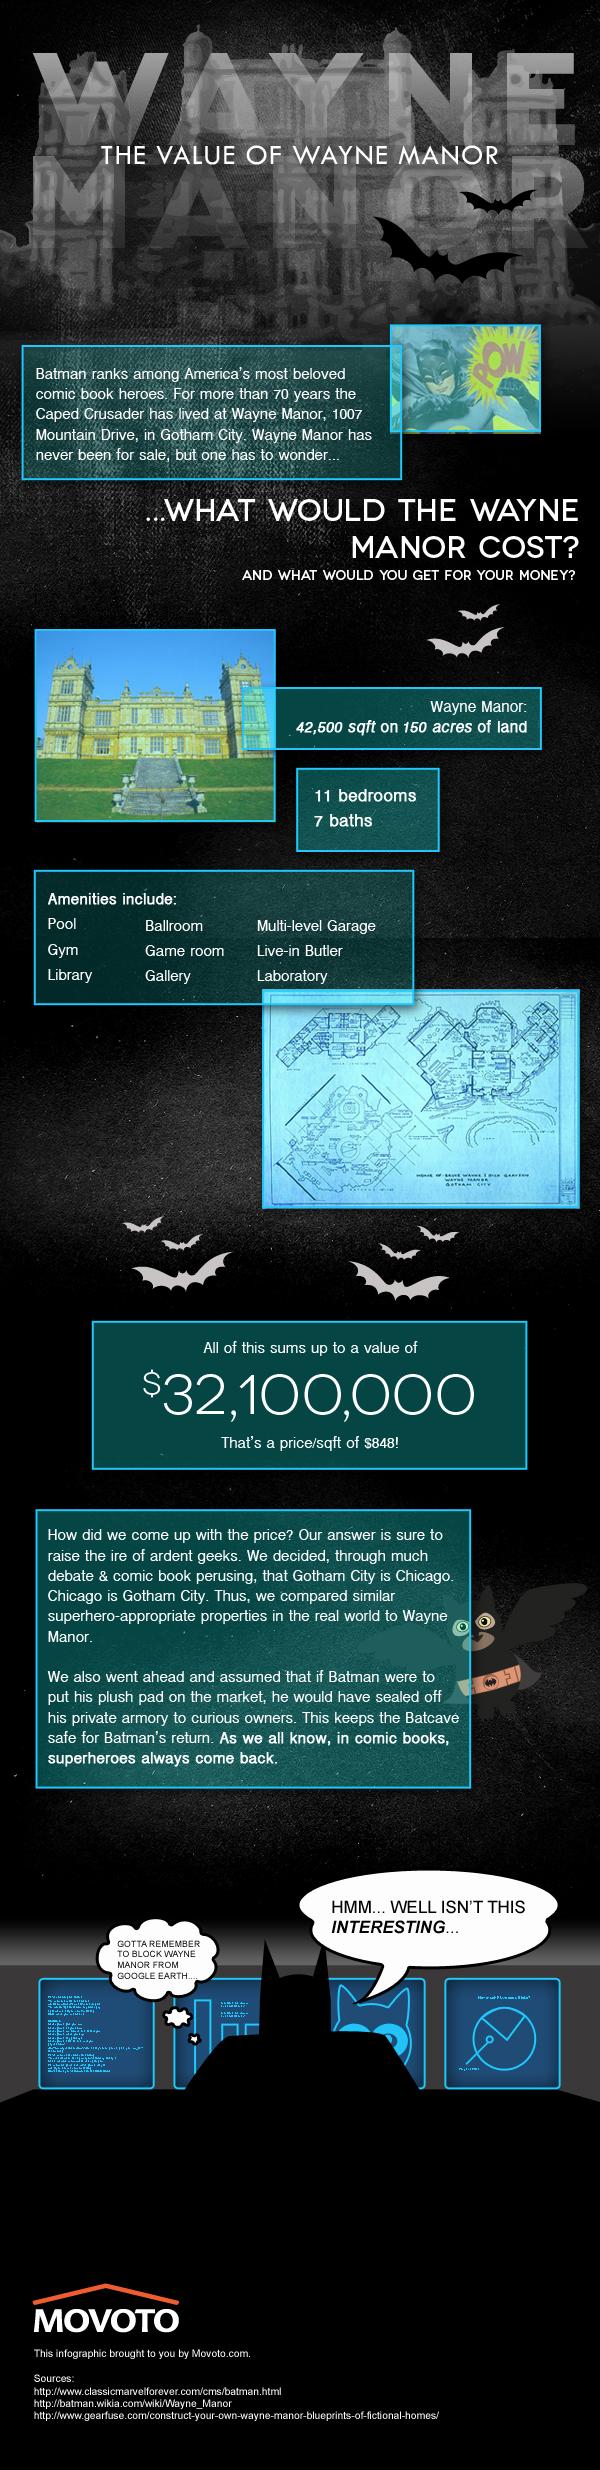 Batman's Wayne Manor Valued at $32 Millon